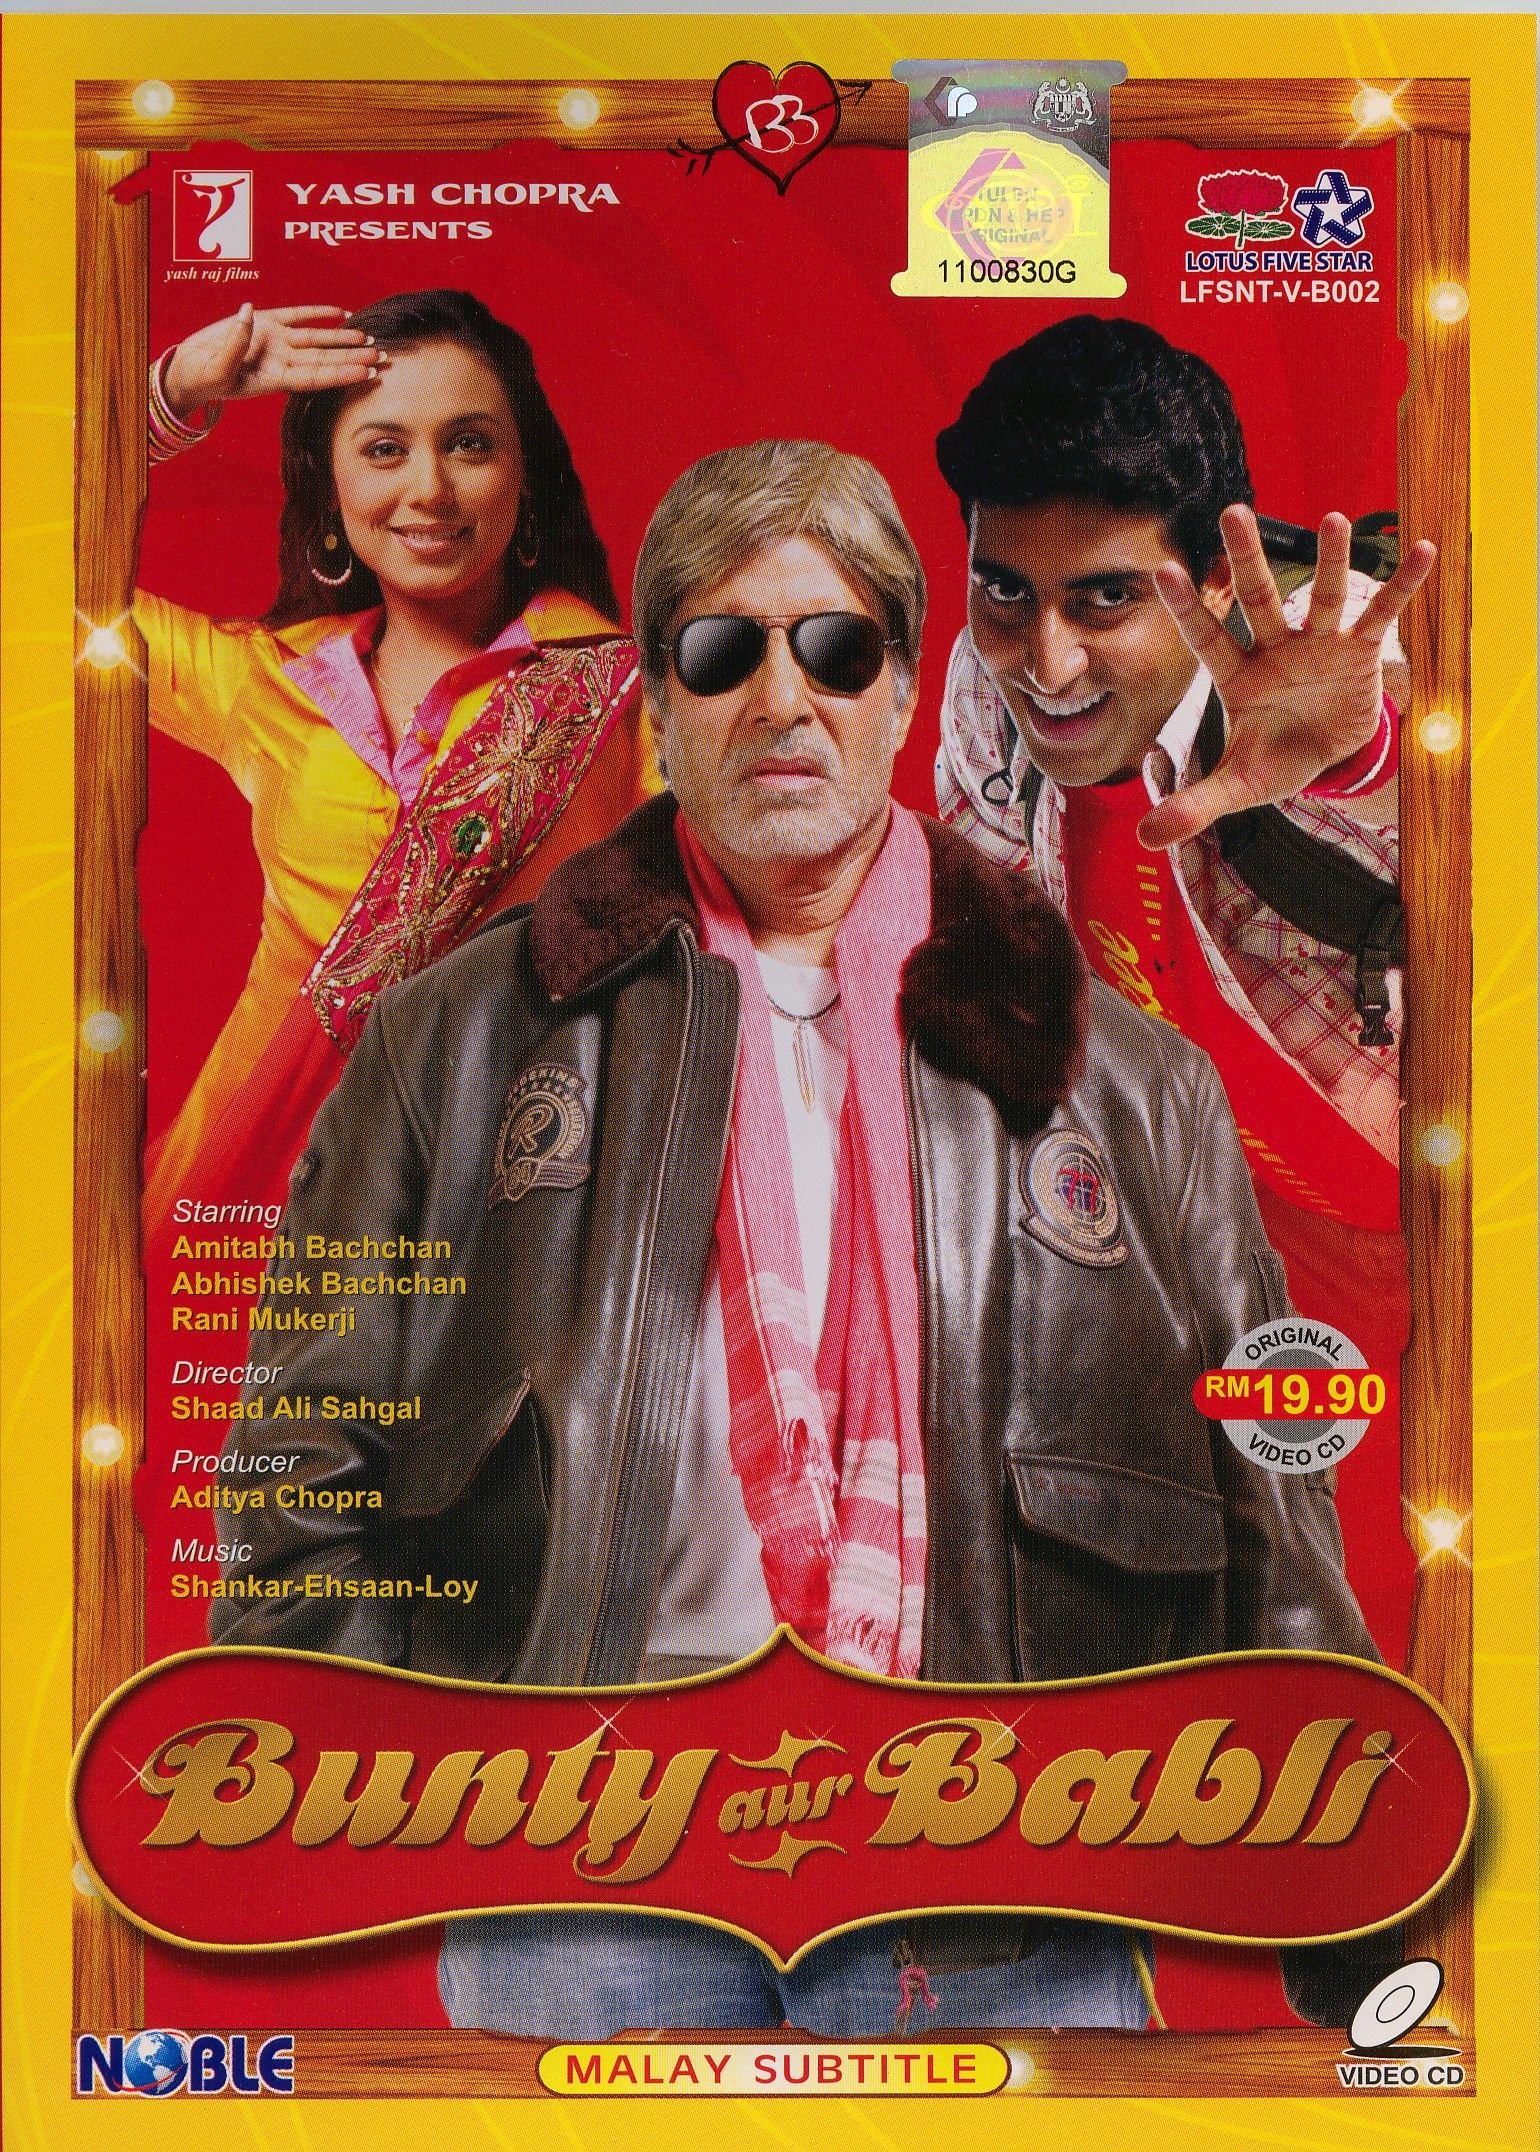 Bunty aur Babli (2005) | Everything Film | Pinterest ...